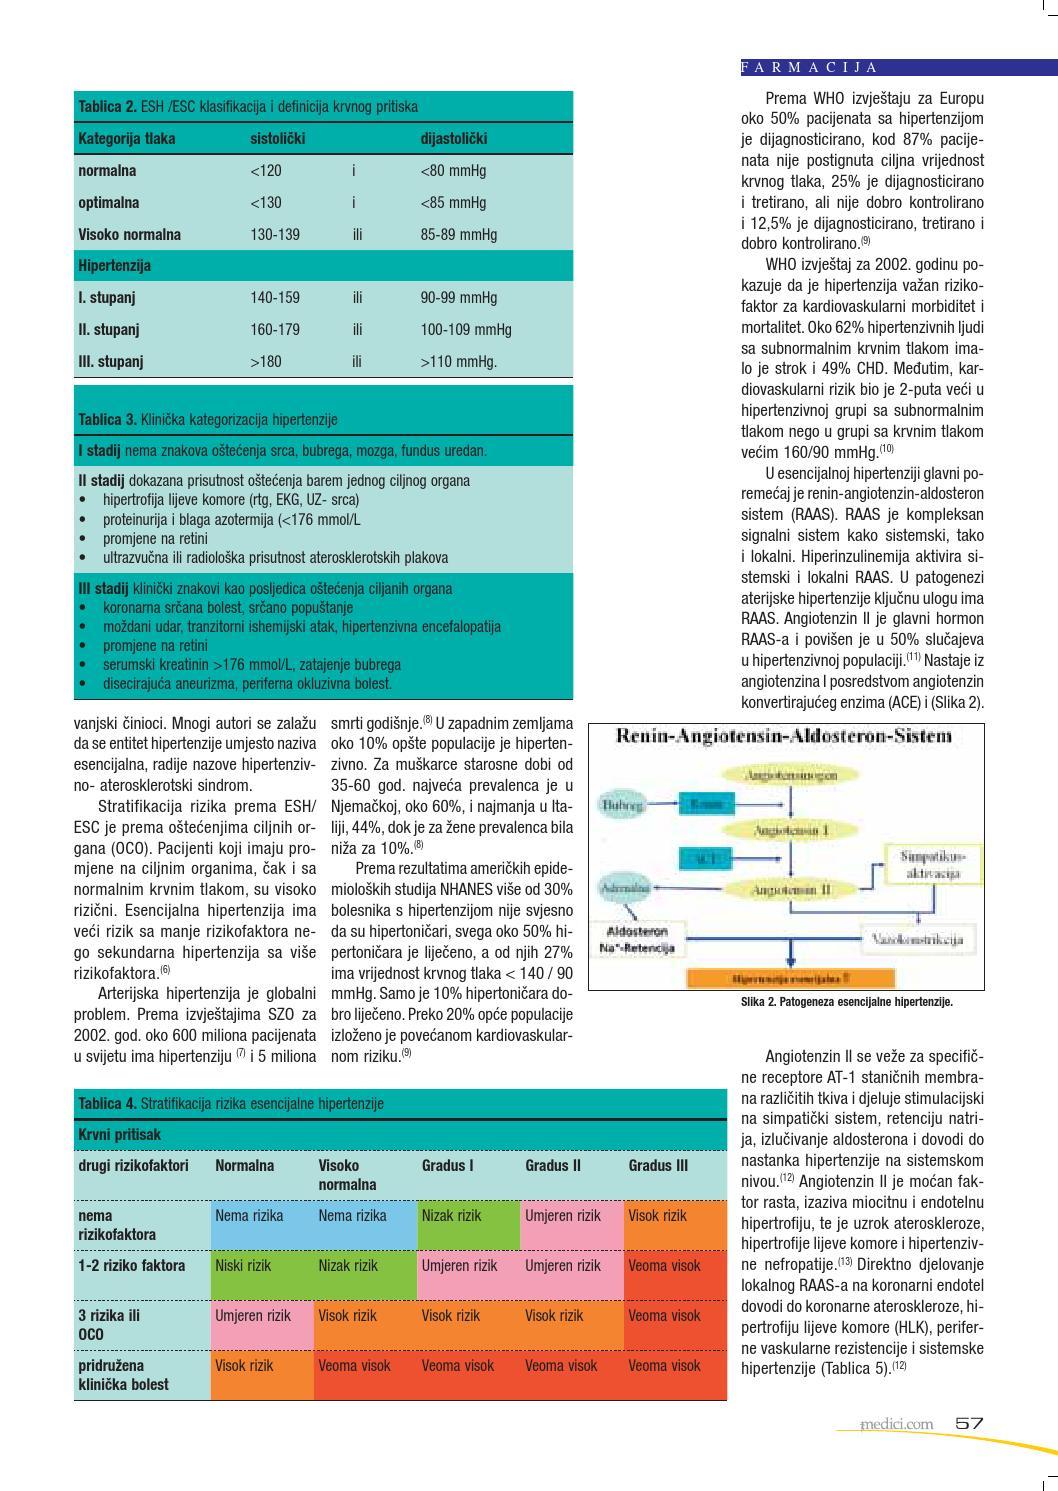 stadij 1 rizik hipertenzije 3